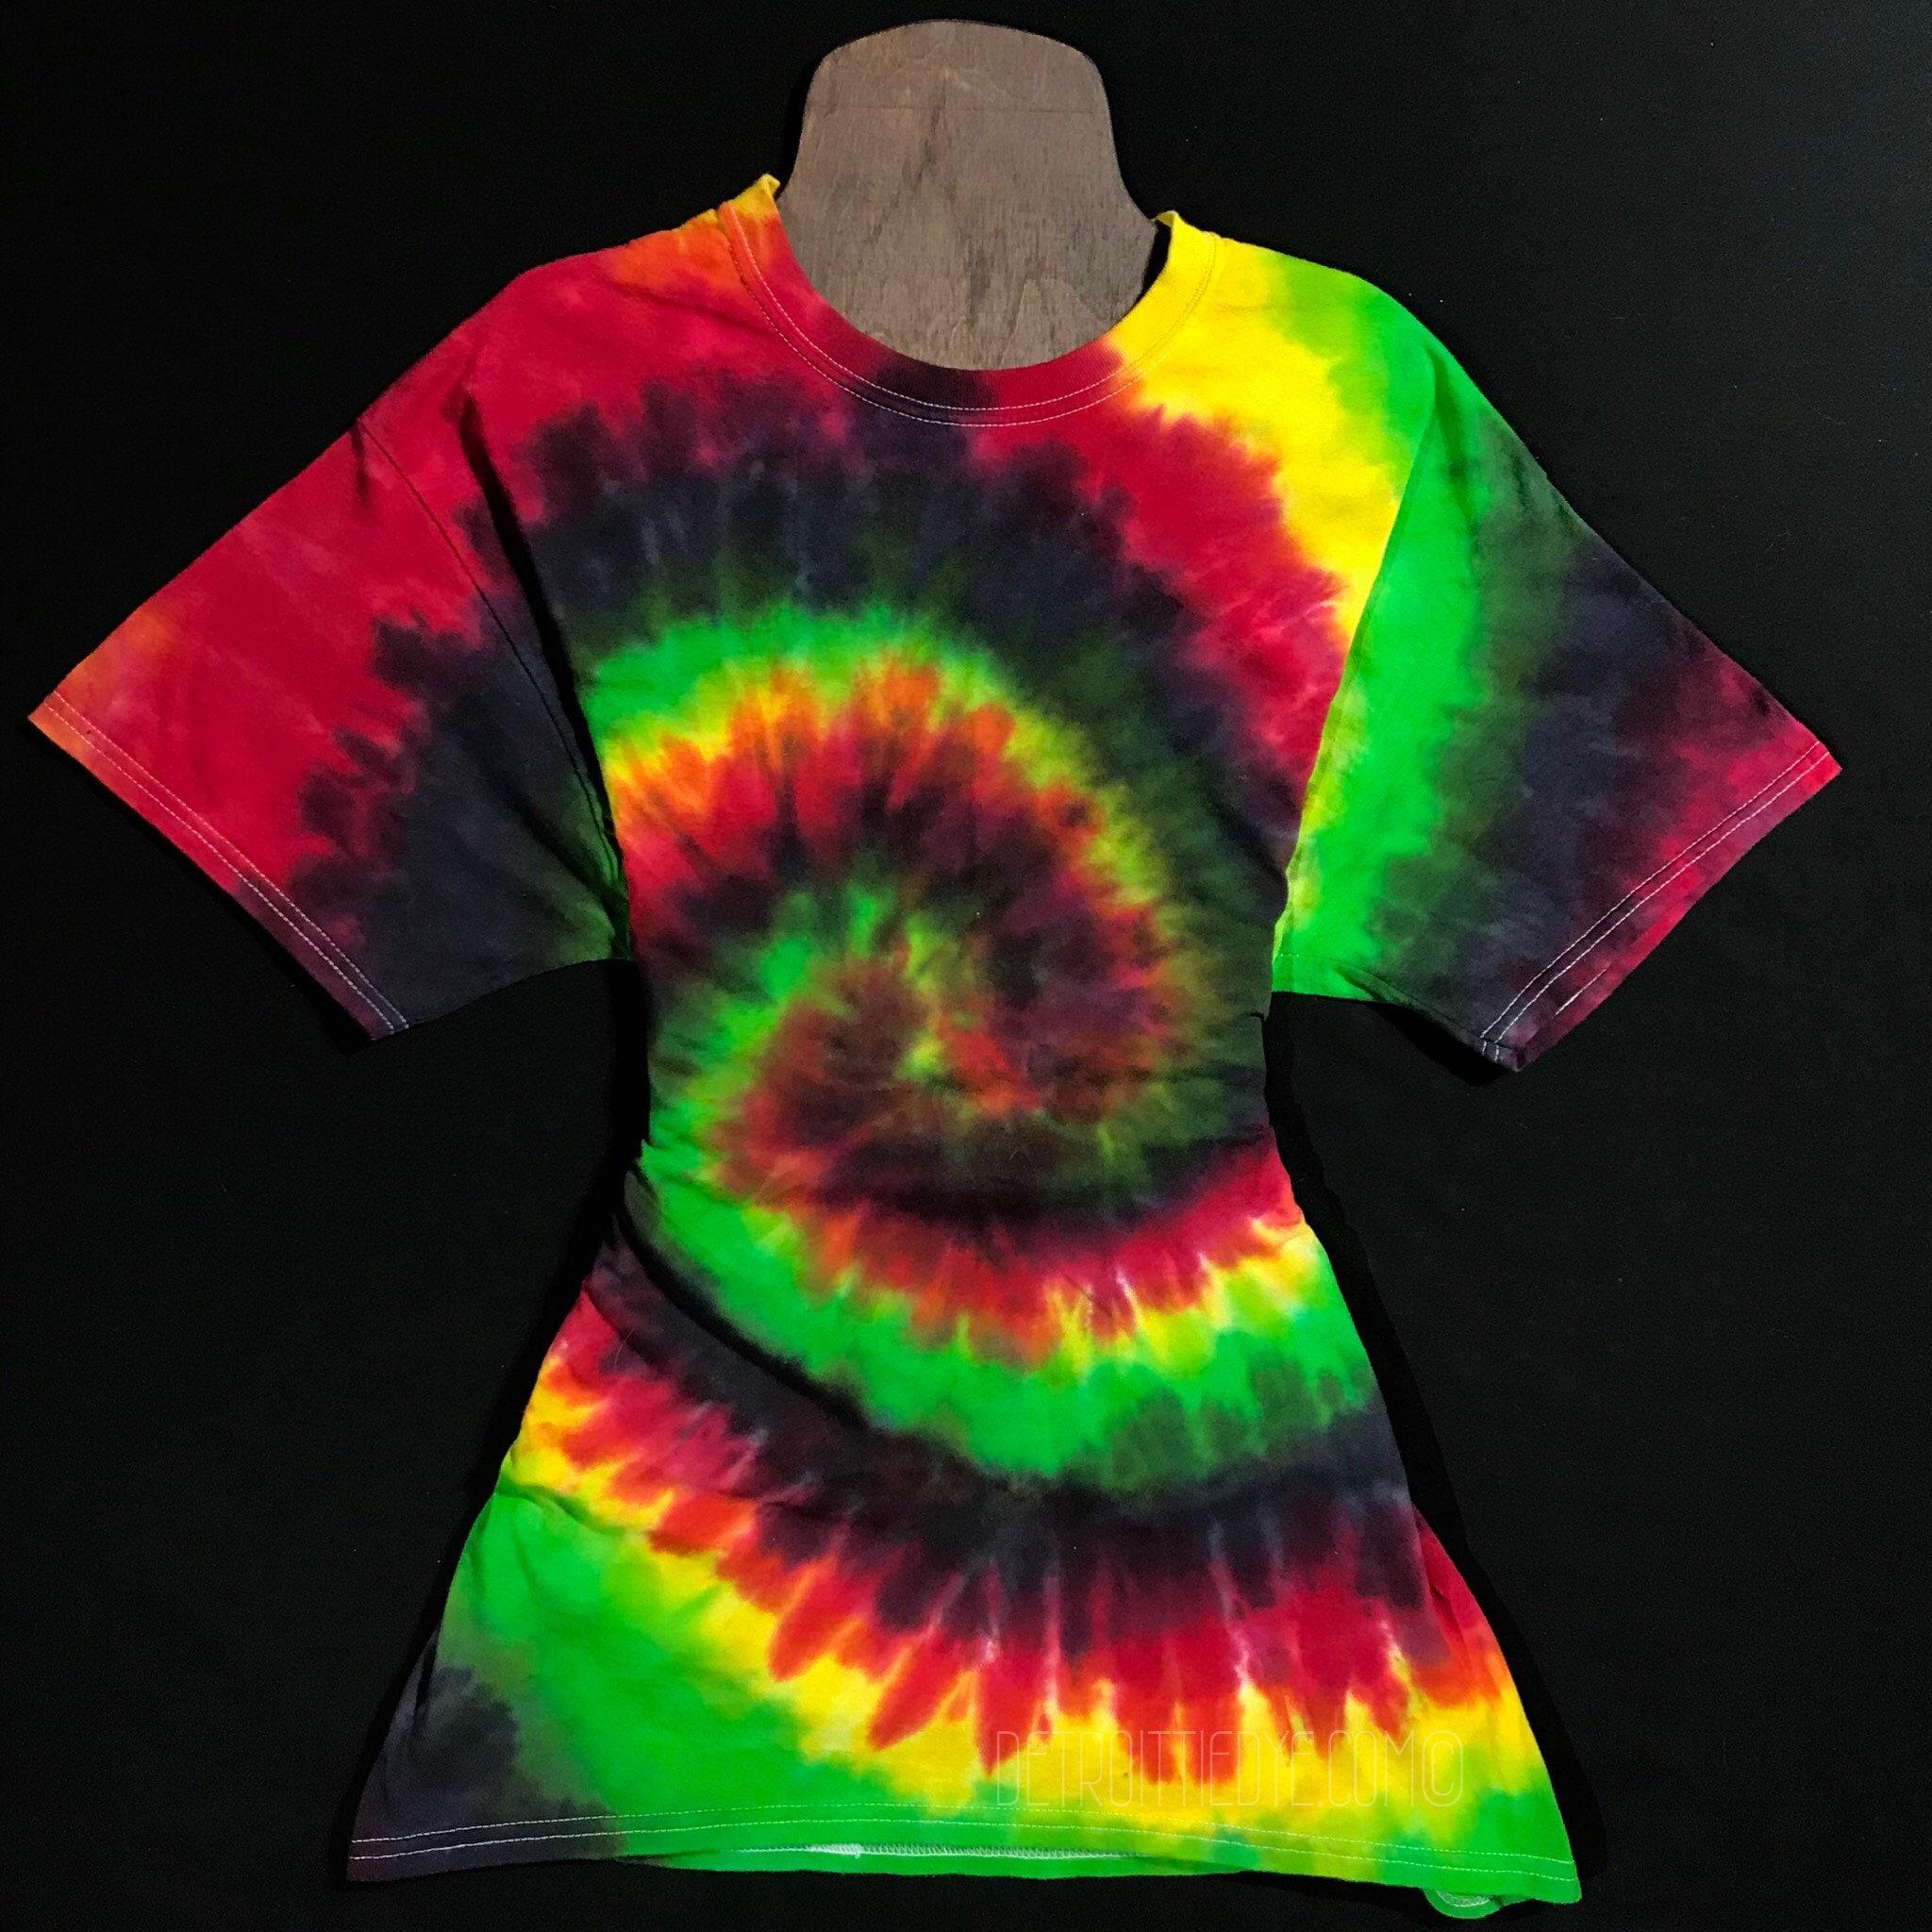 Custom Made Tie Dye Shirt Rasta Tie Dye T Shirt Made To Etsy